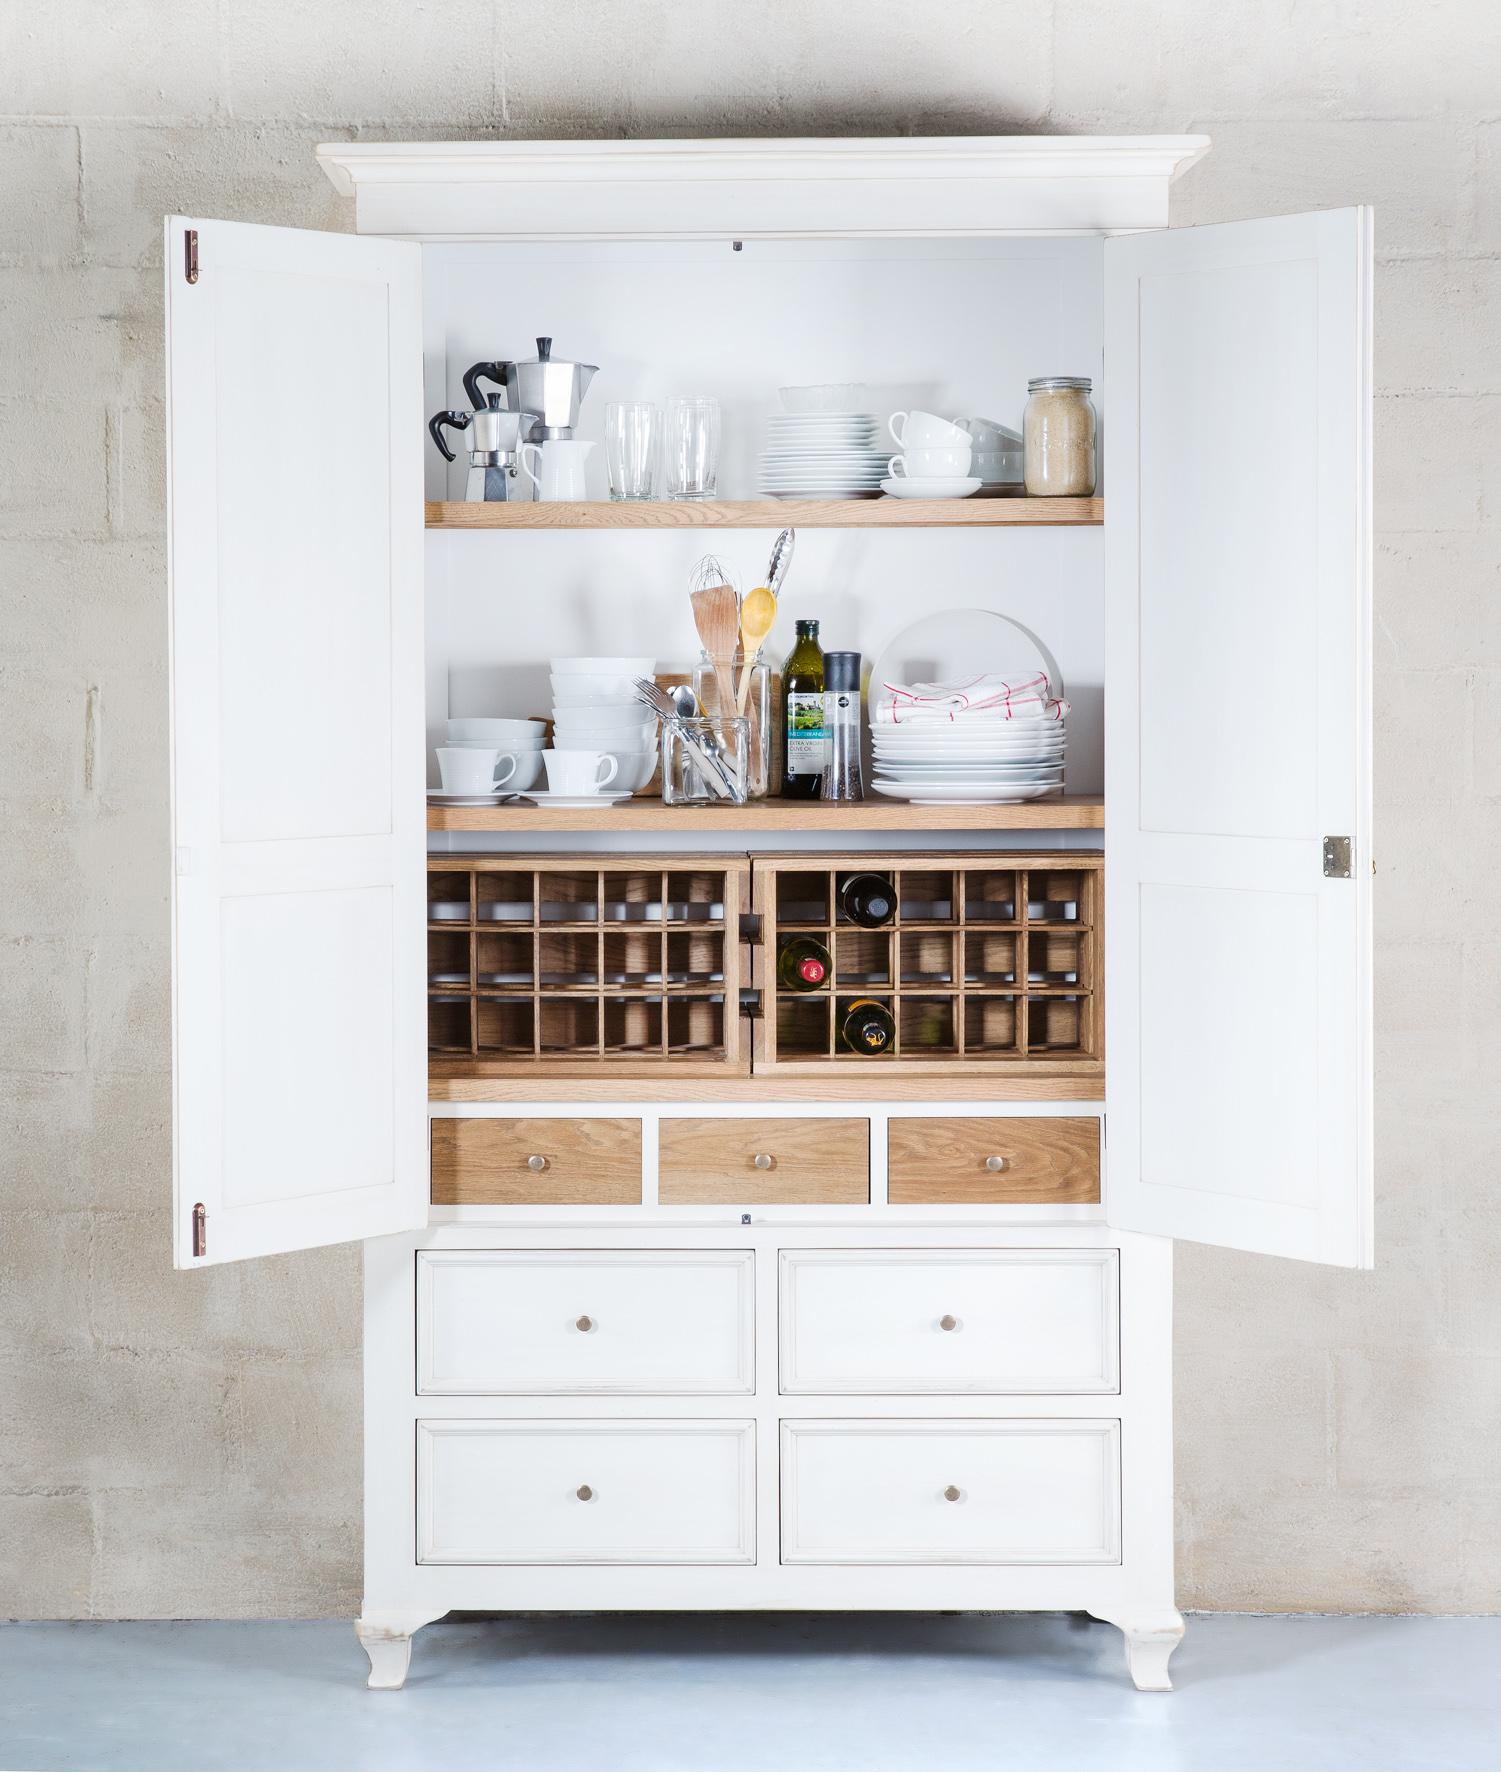 Block & Chisel Antique White utility cupboard